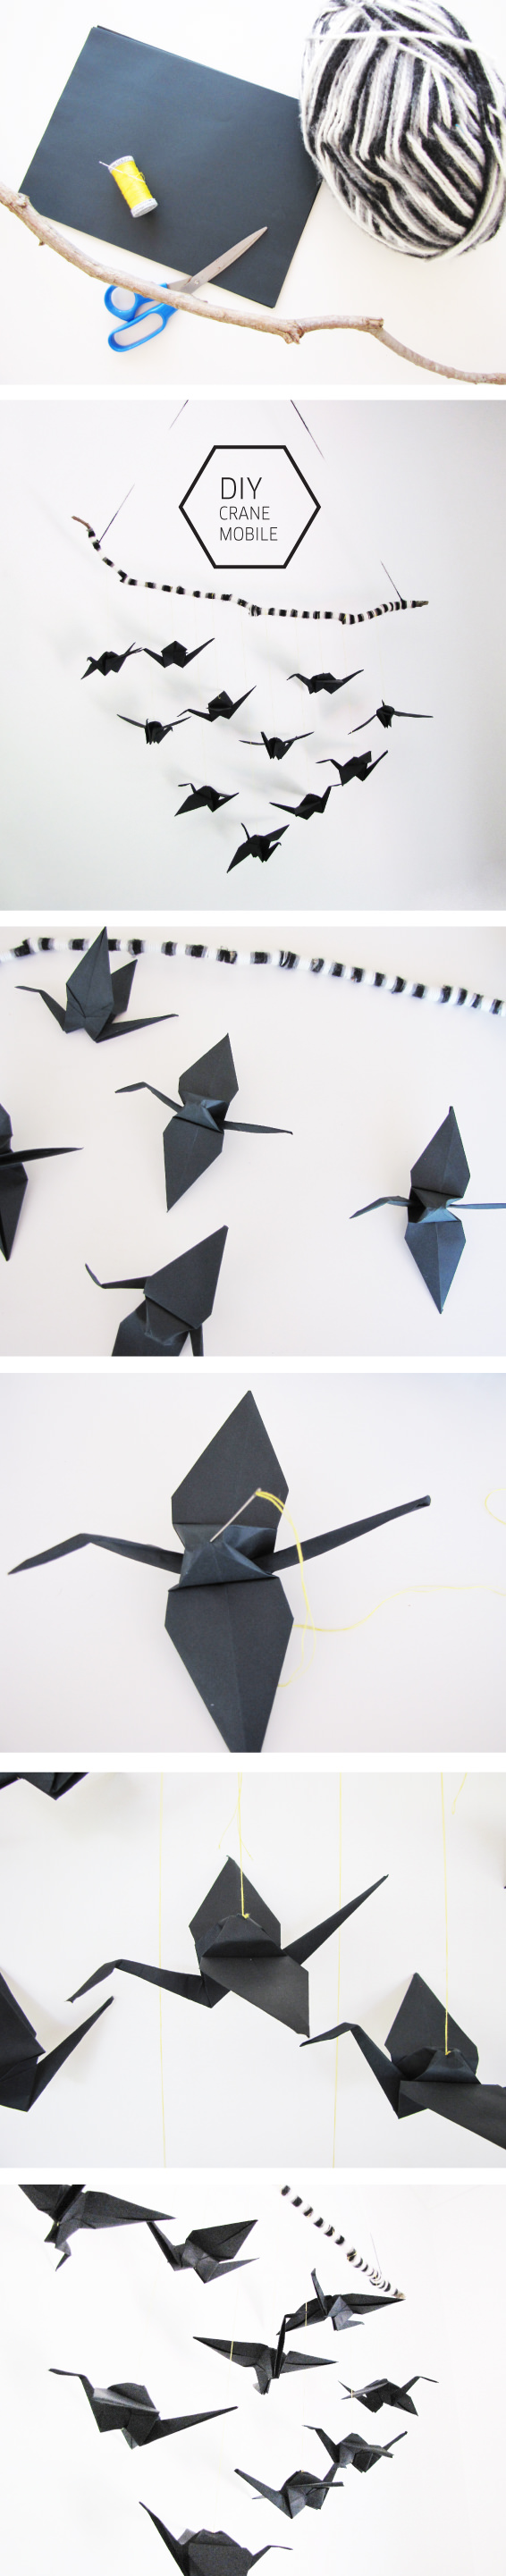 TOMFO-DIY-CRANE-MOBILE